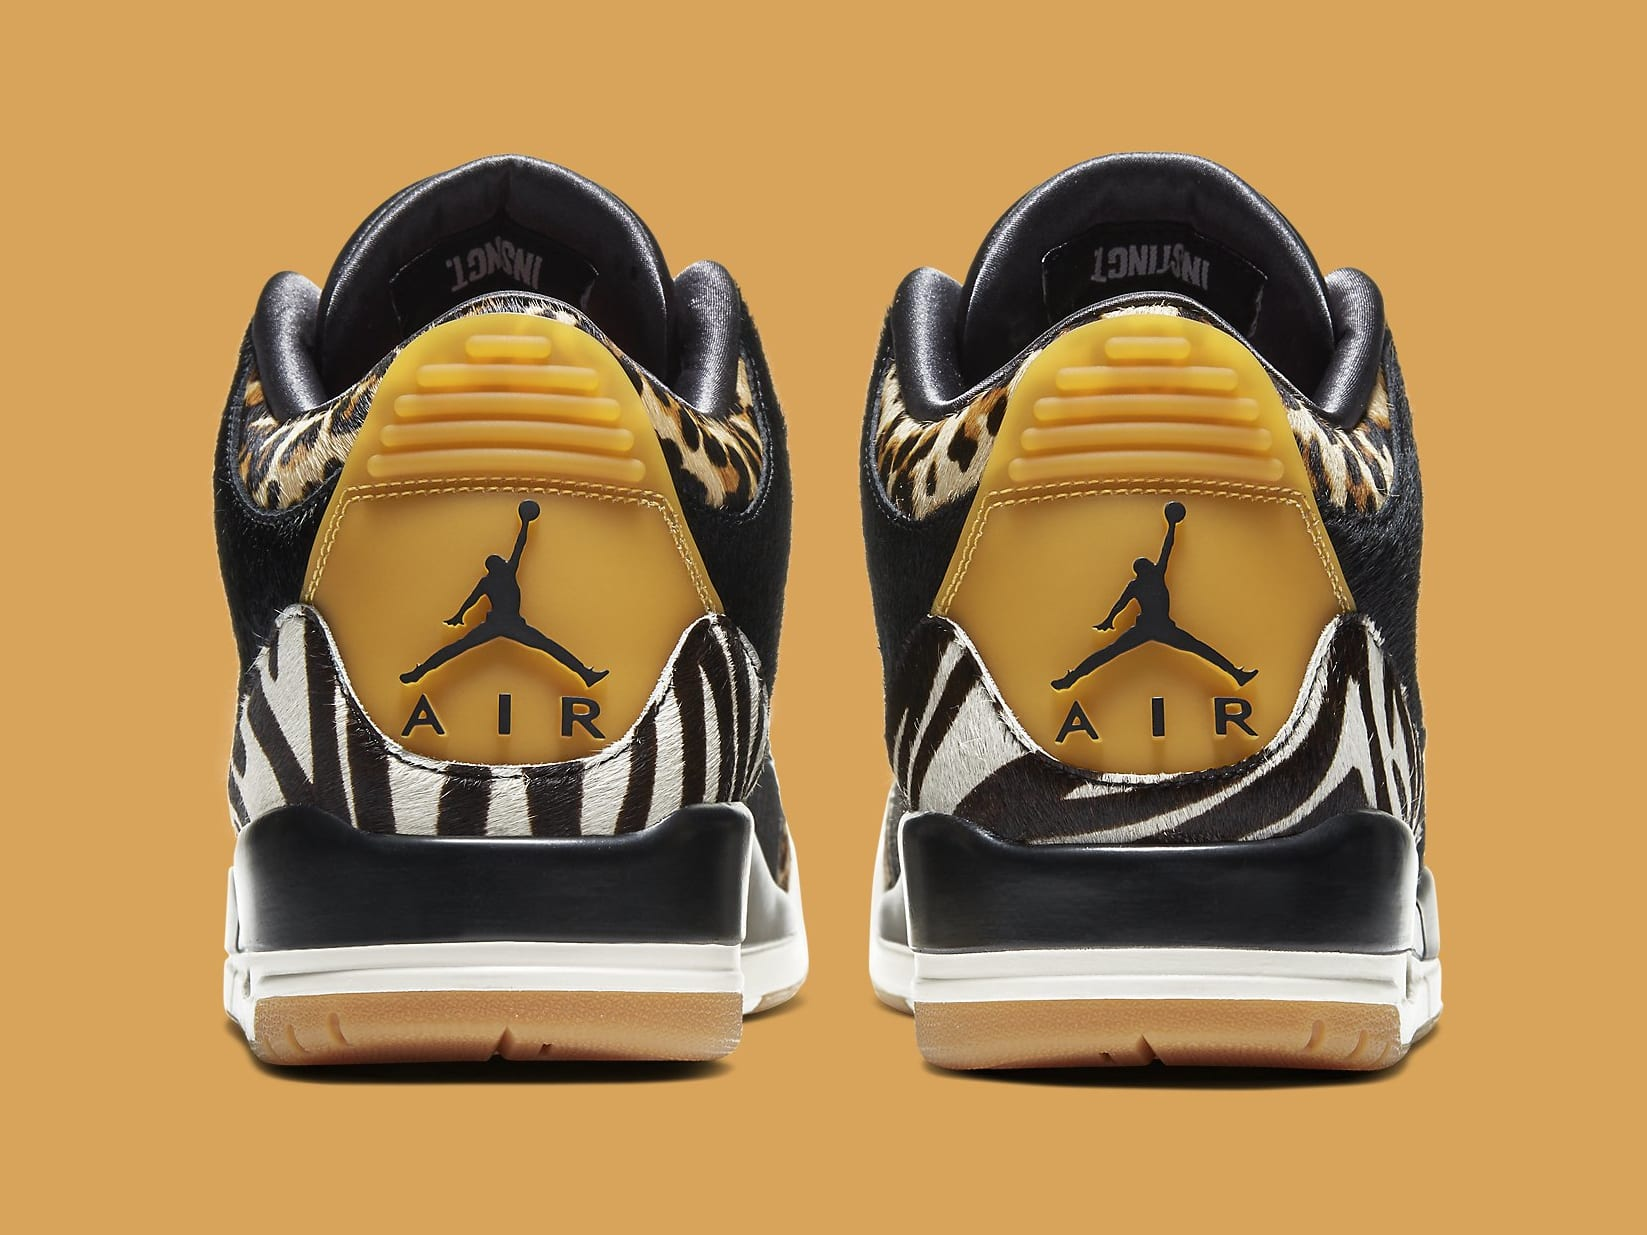 Air Jordan 3 Animal Instinct Release Date CK4344-002 Heel